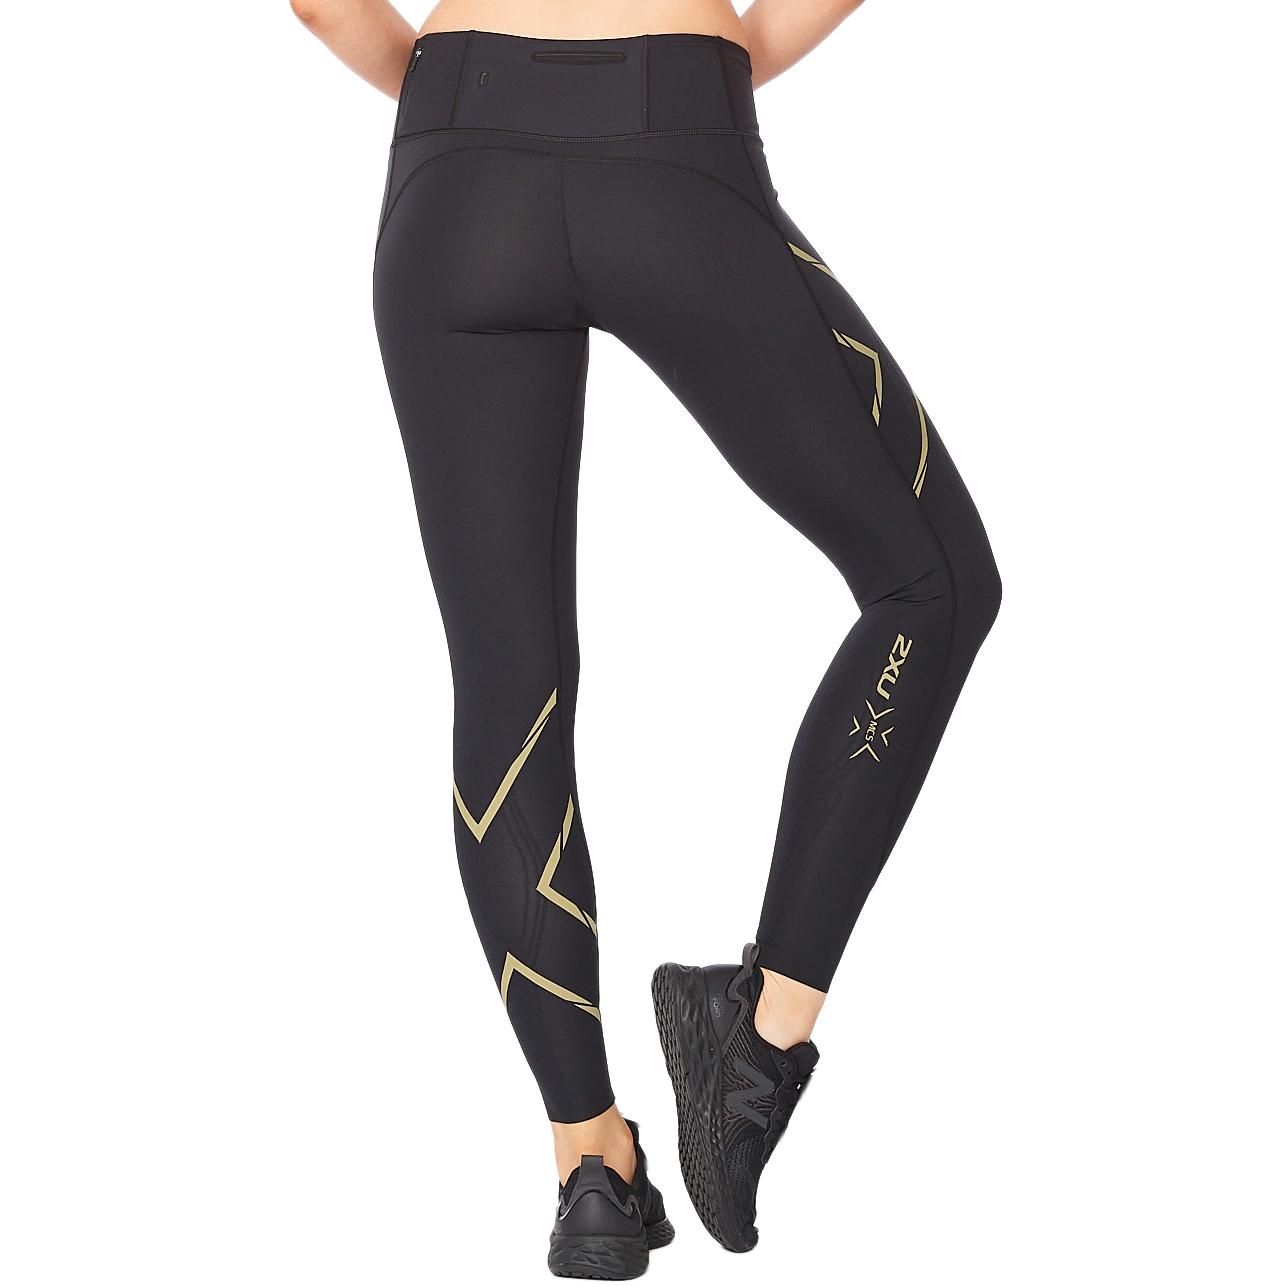 Imagen de 2XU Light Speed Mid-Rise Compression Mallas para mujer - Tall - black/gold reflective